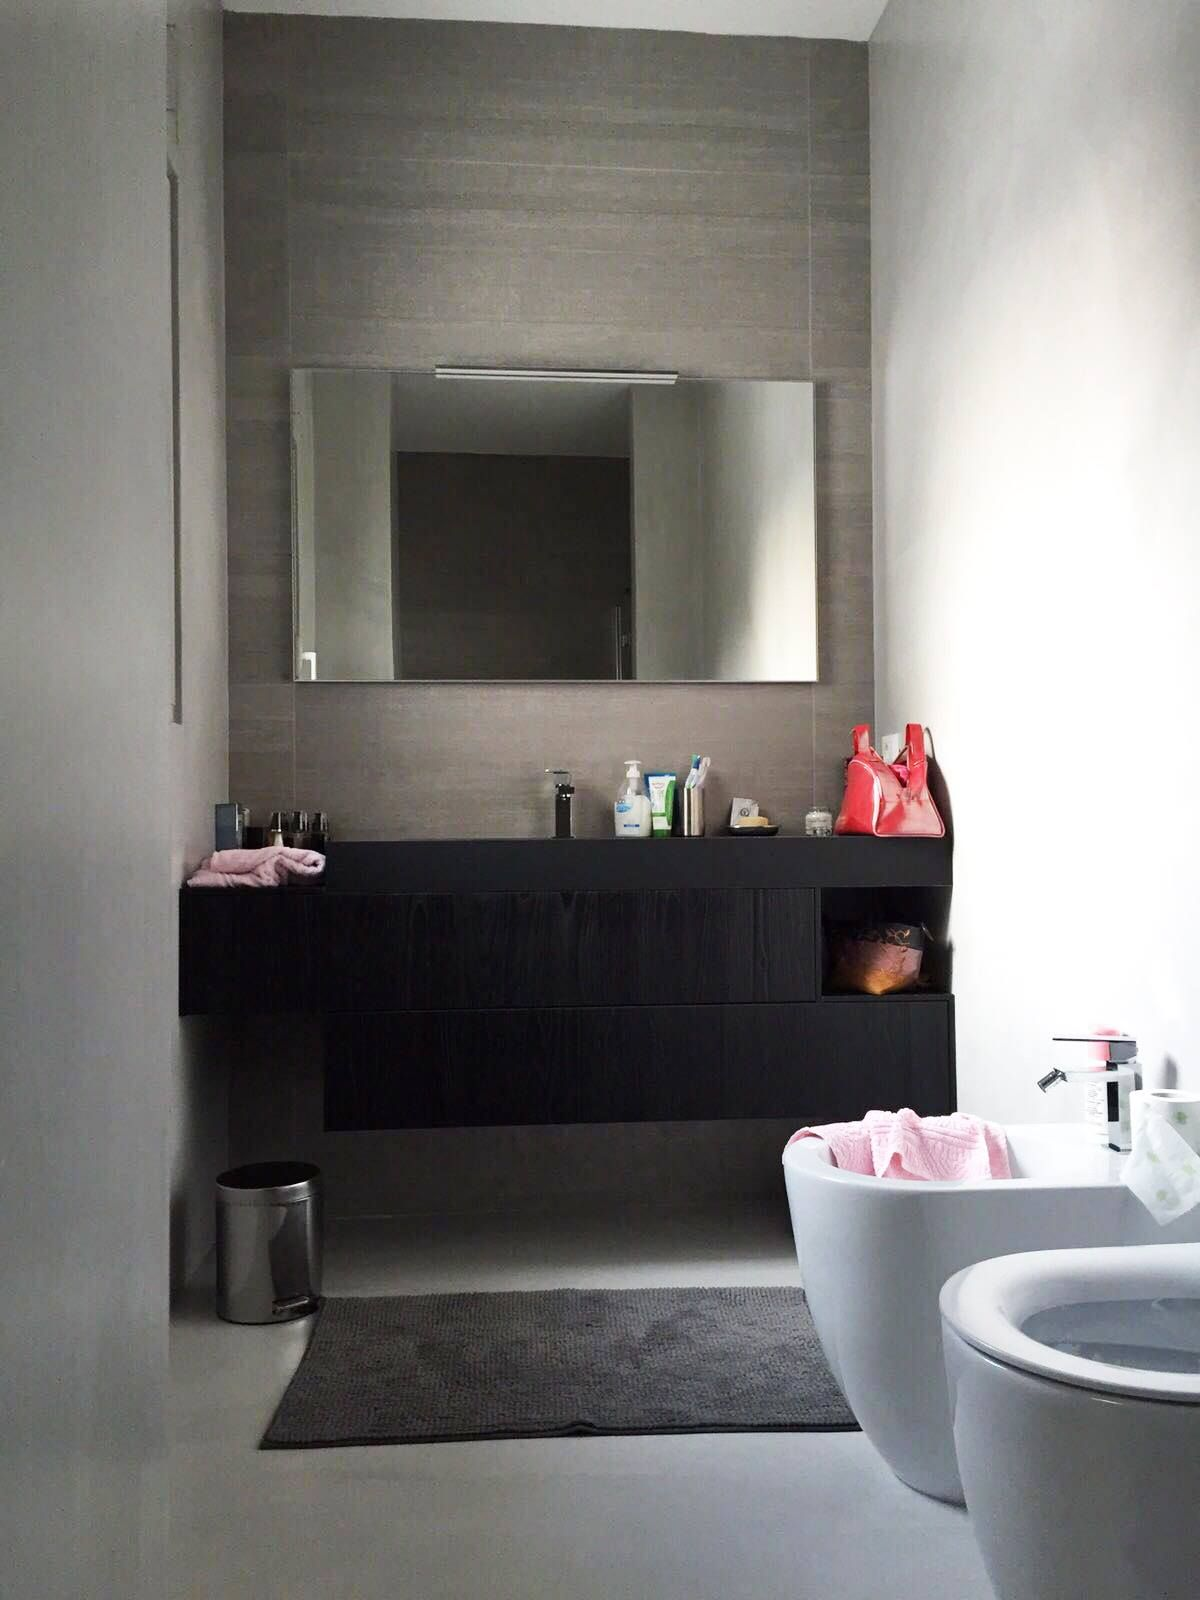 sense arredo bagno moderno mobili bagno design around